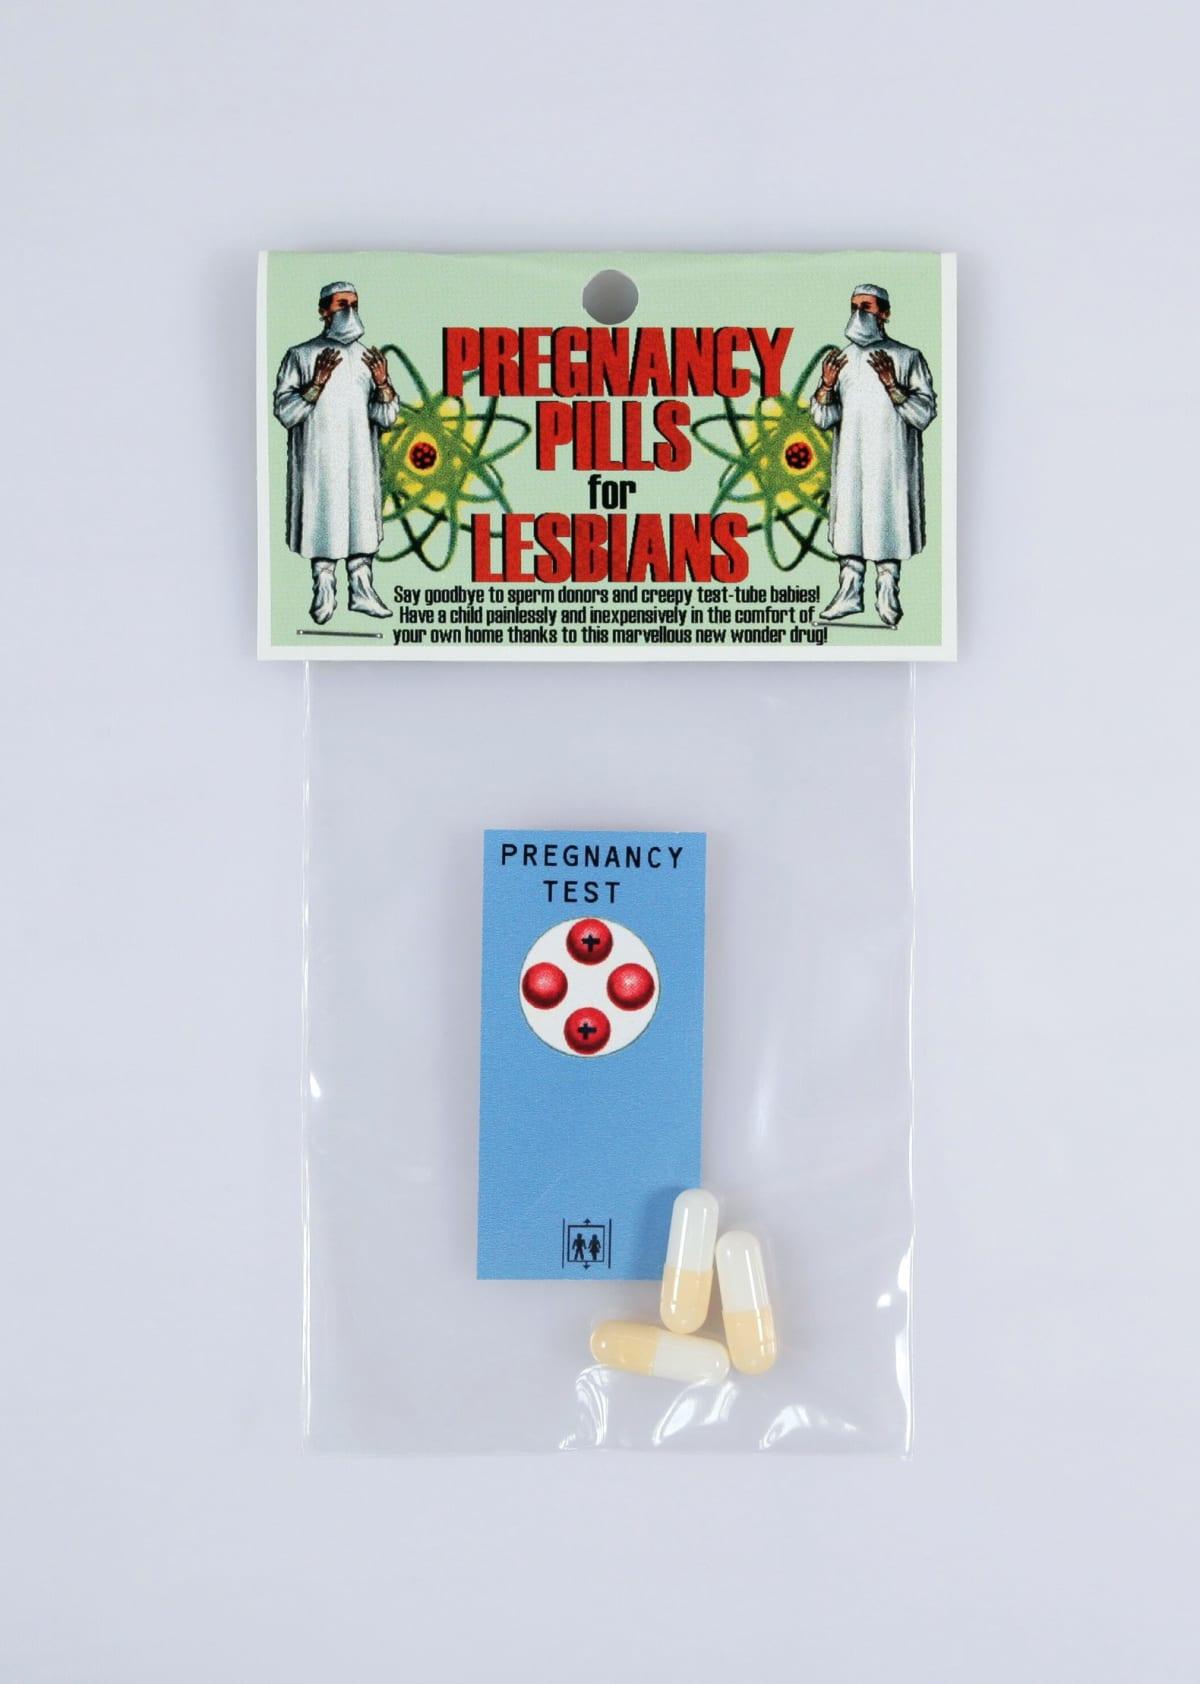 Pregnancy pills for lesbians